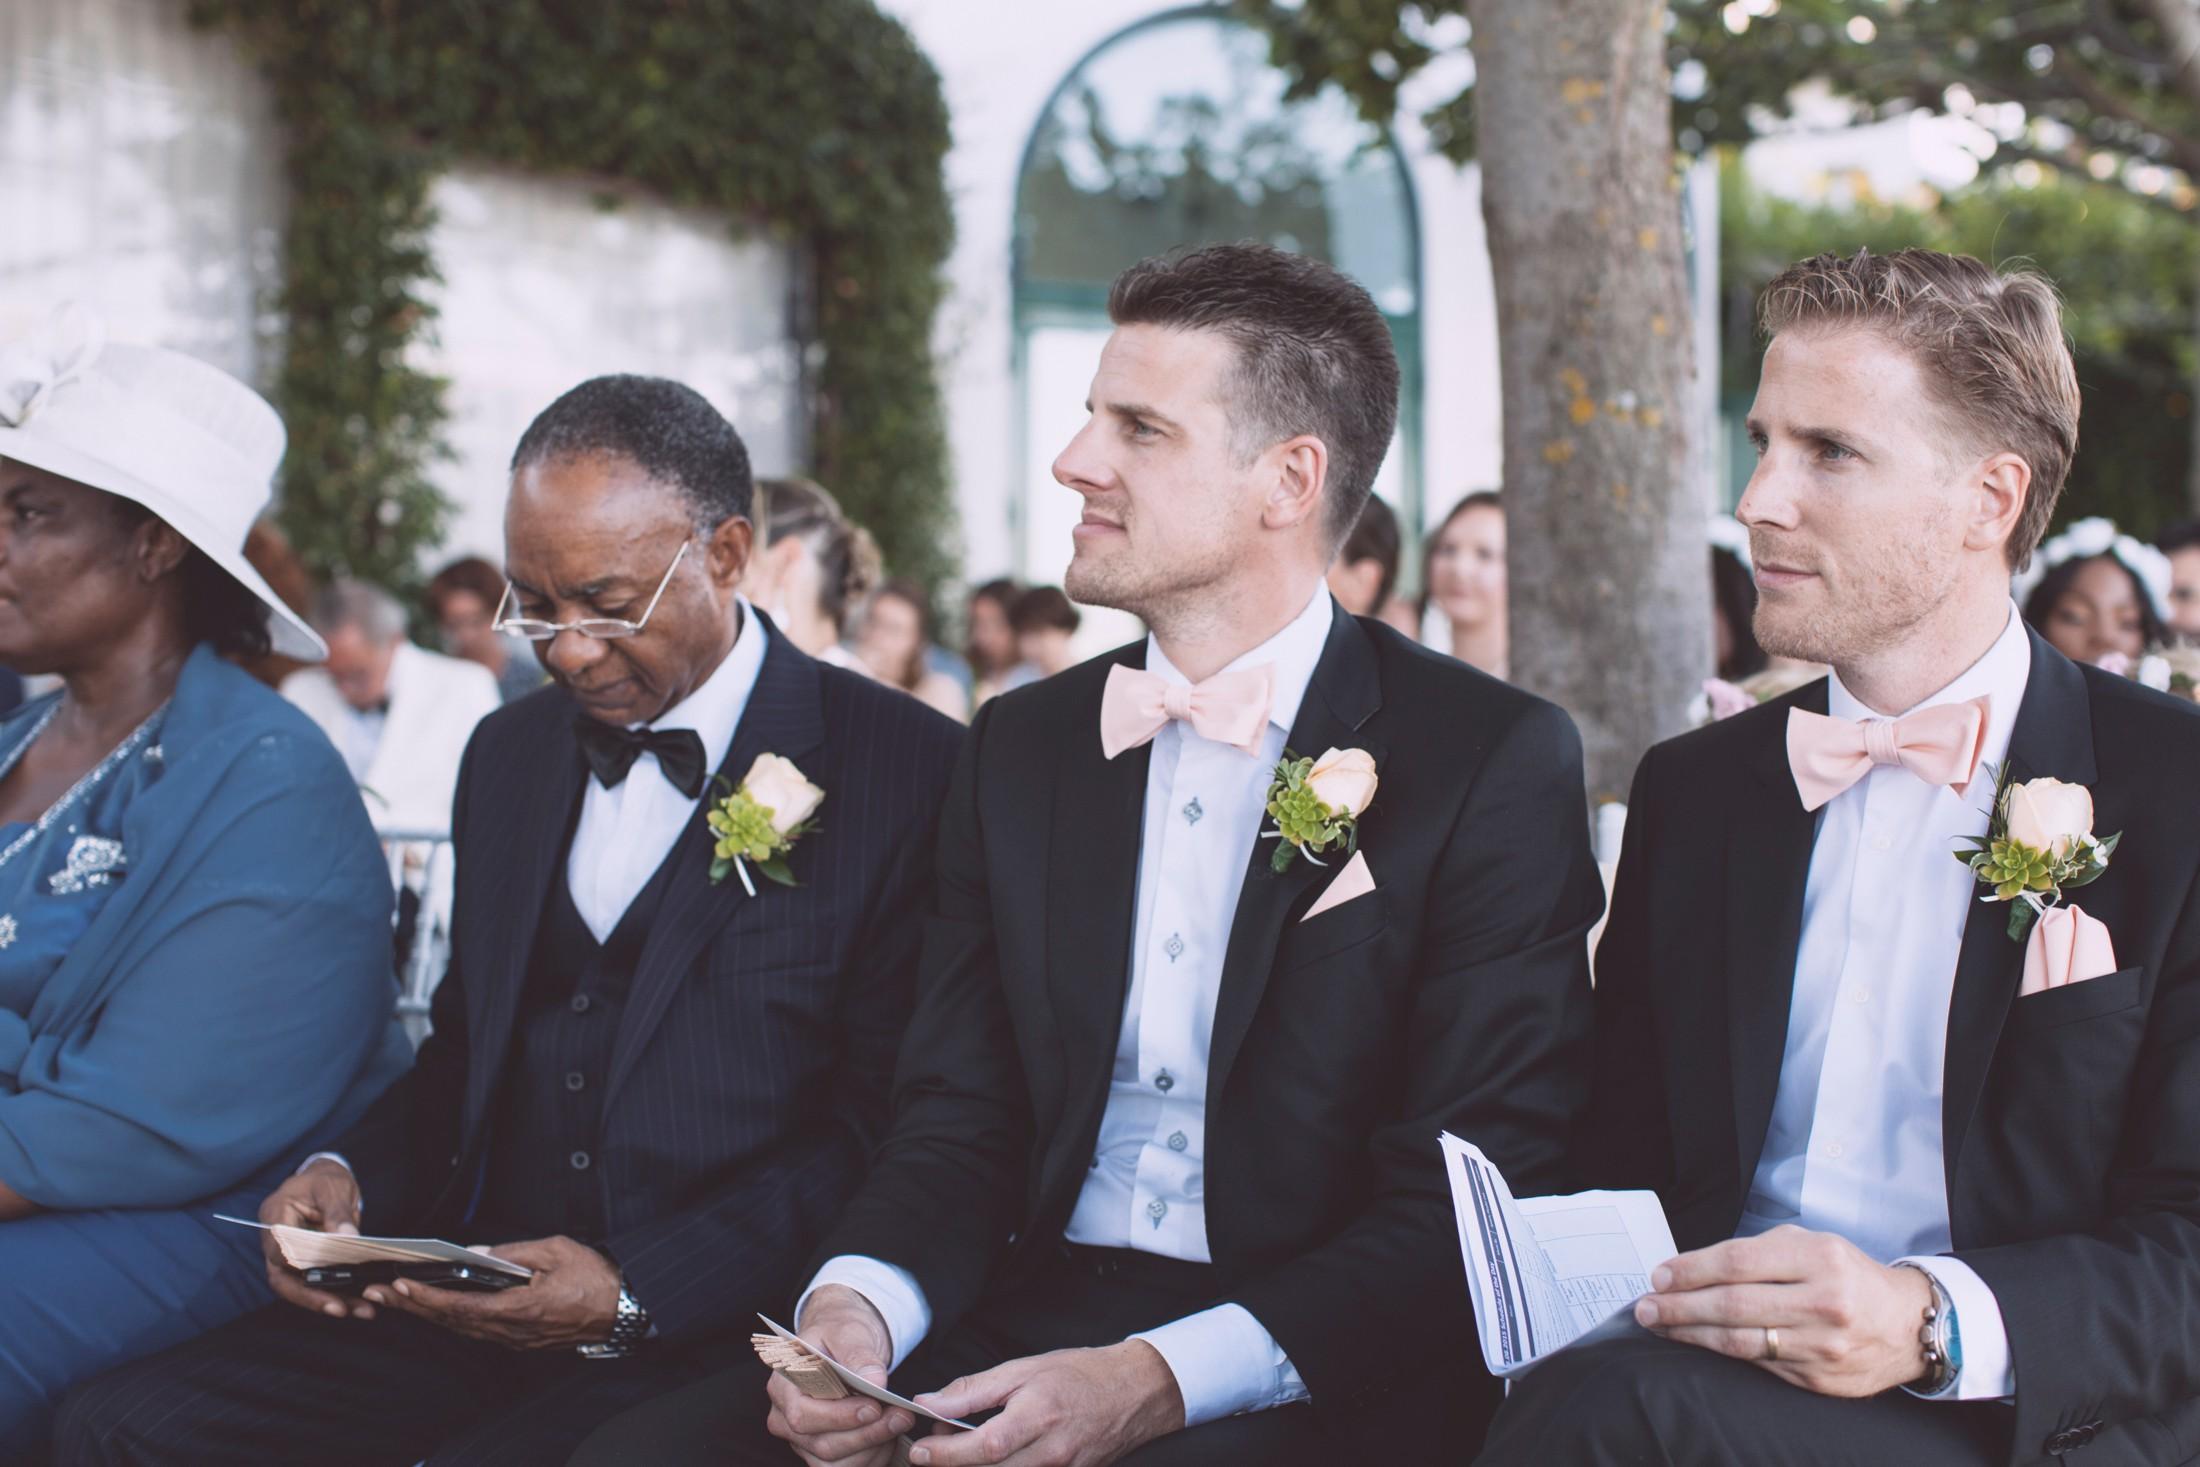 wedding ceremony best men during the ceremony